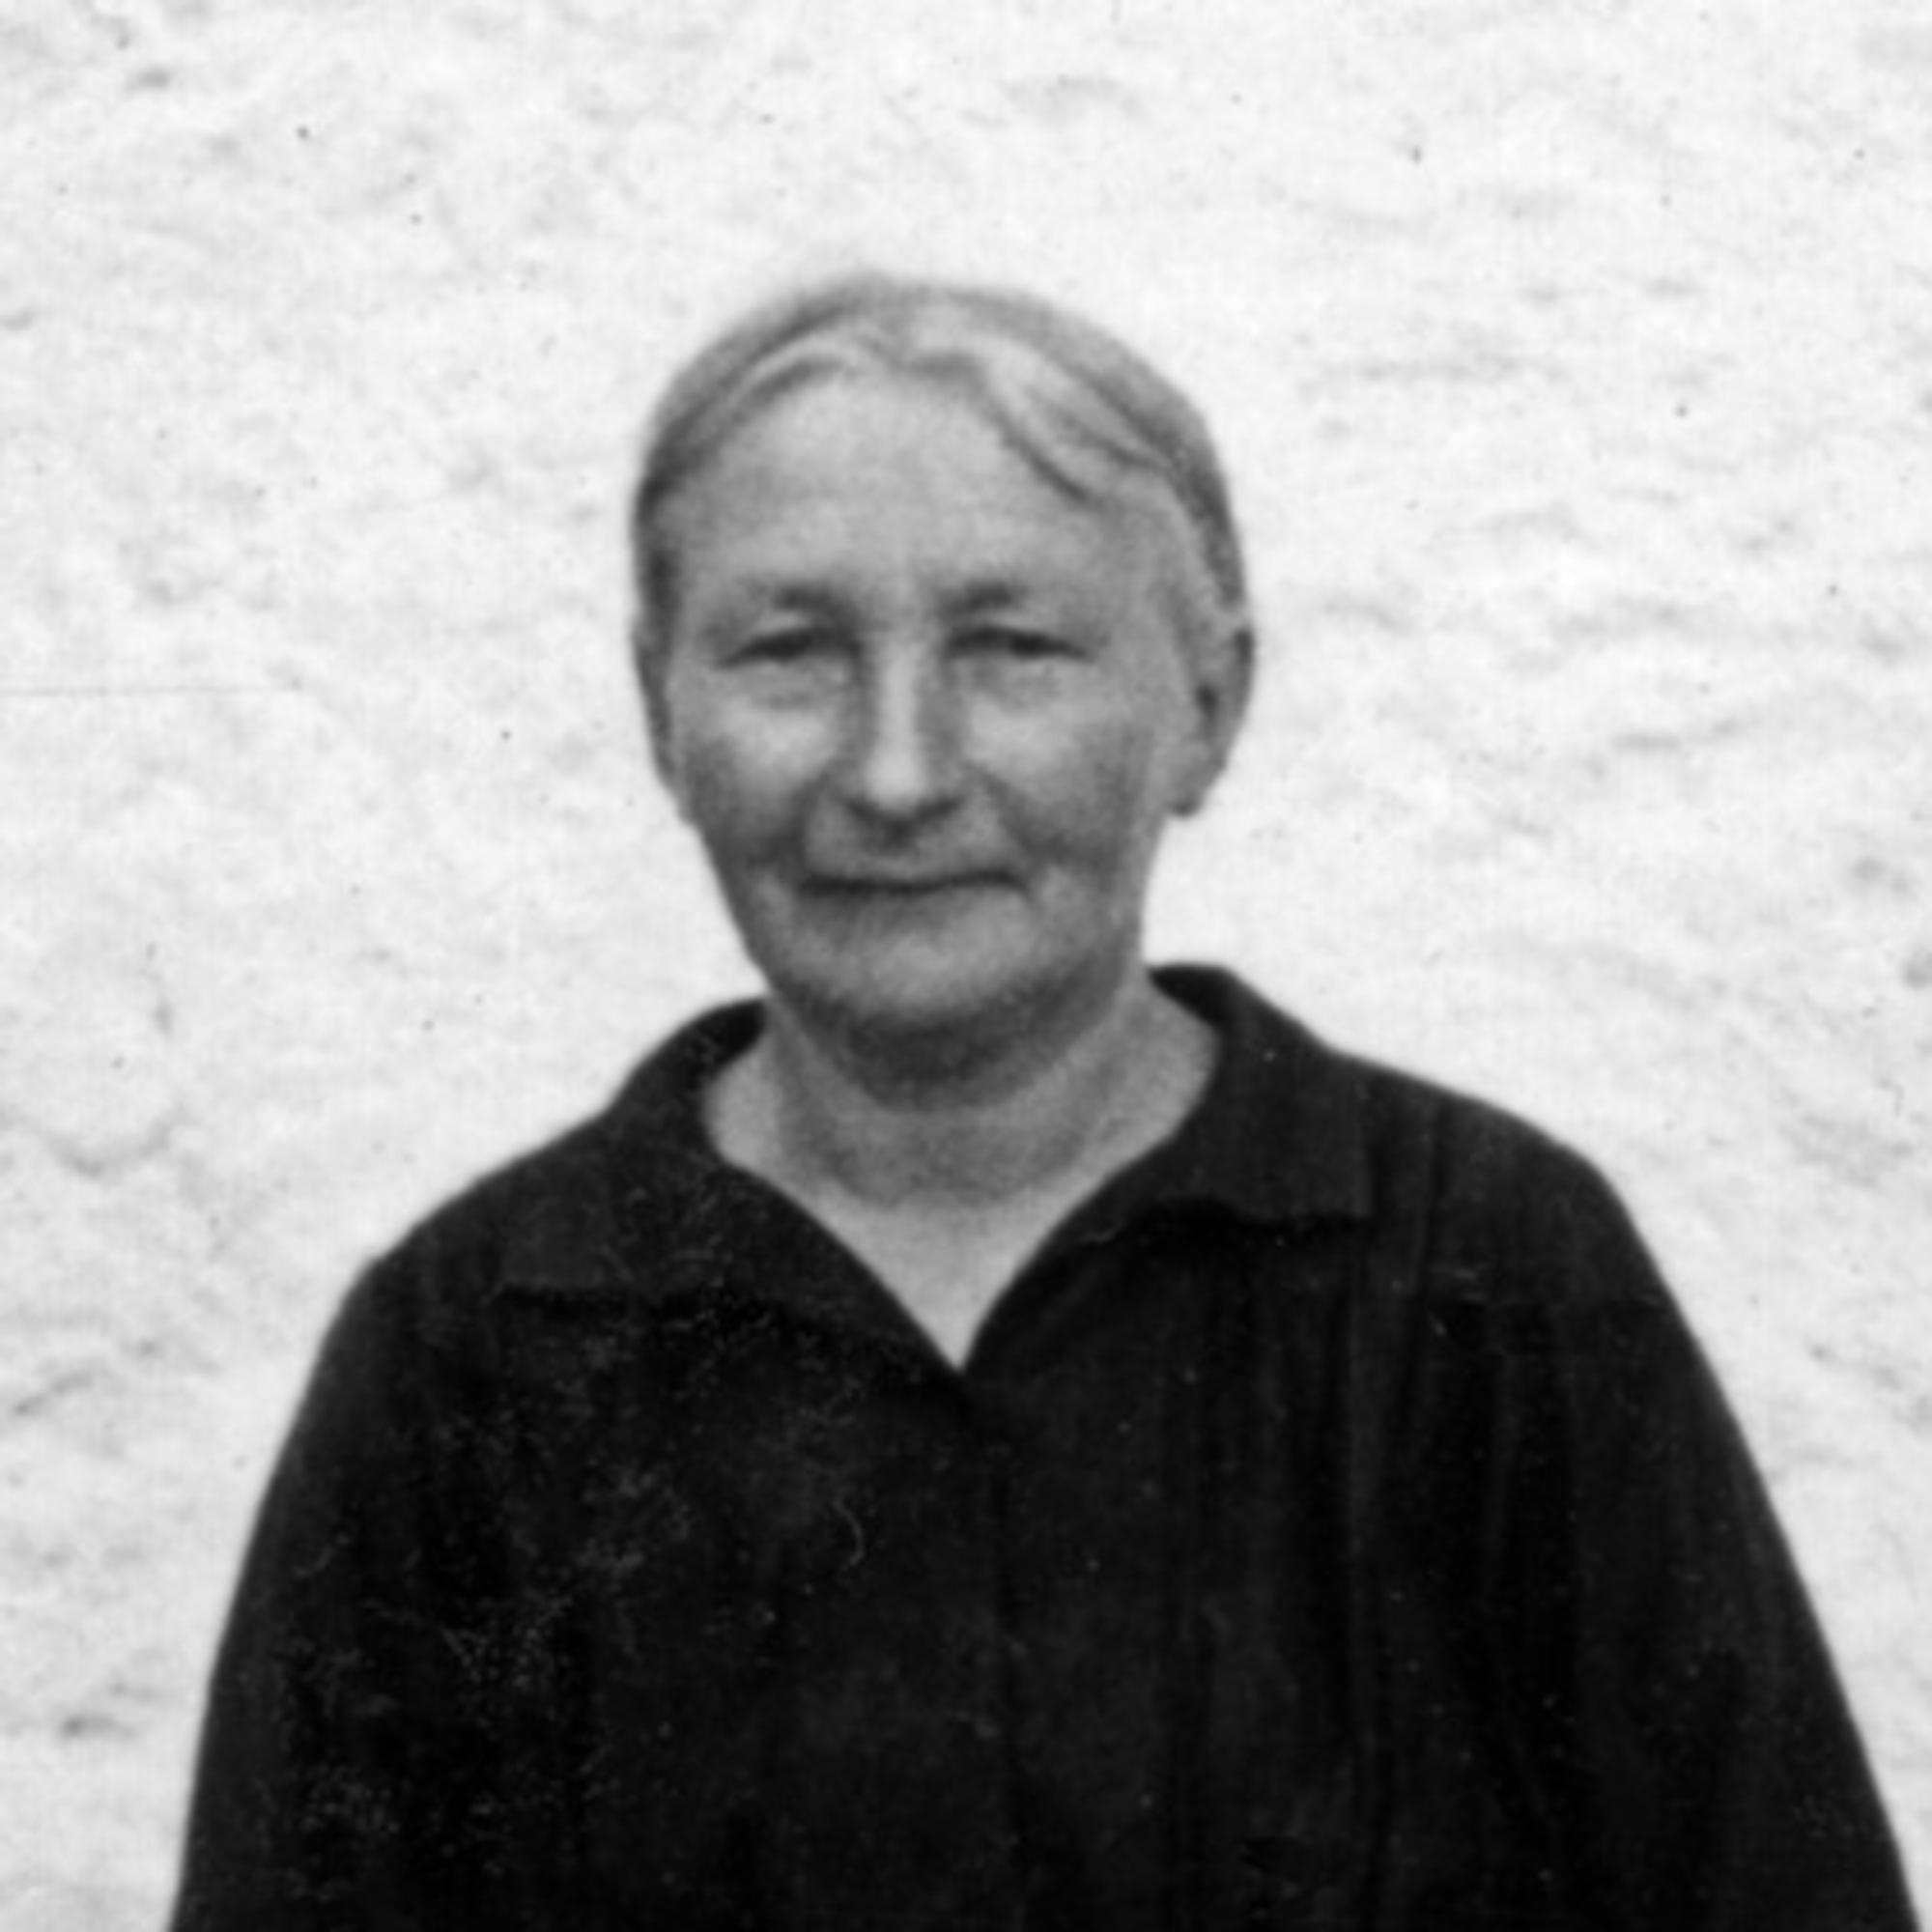 Marie Perrodot portrait